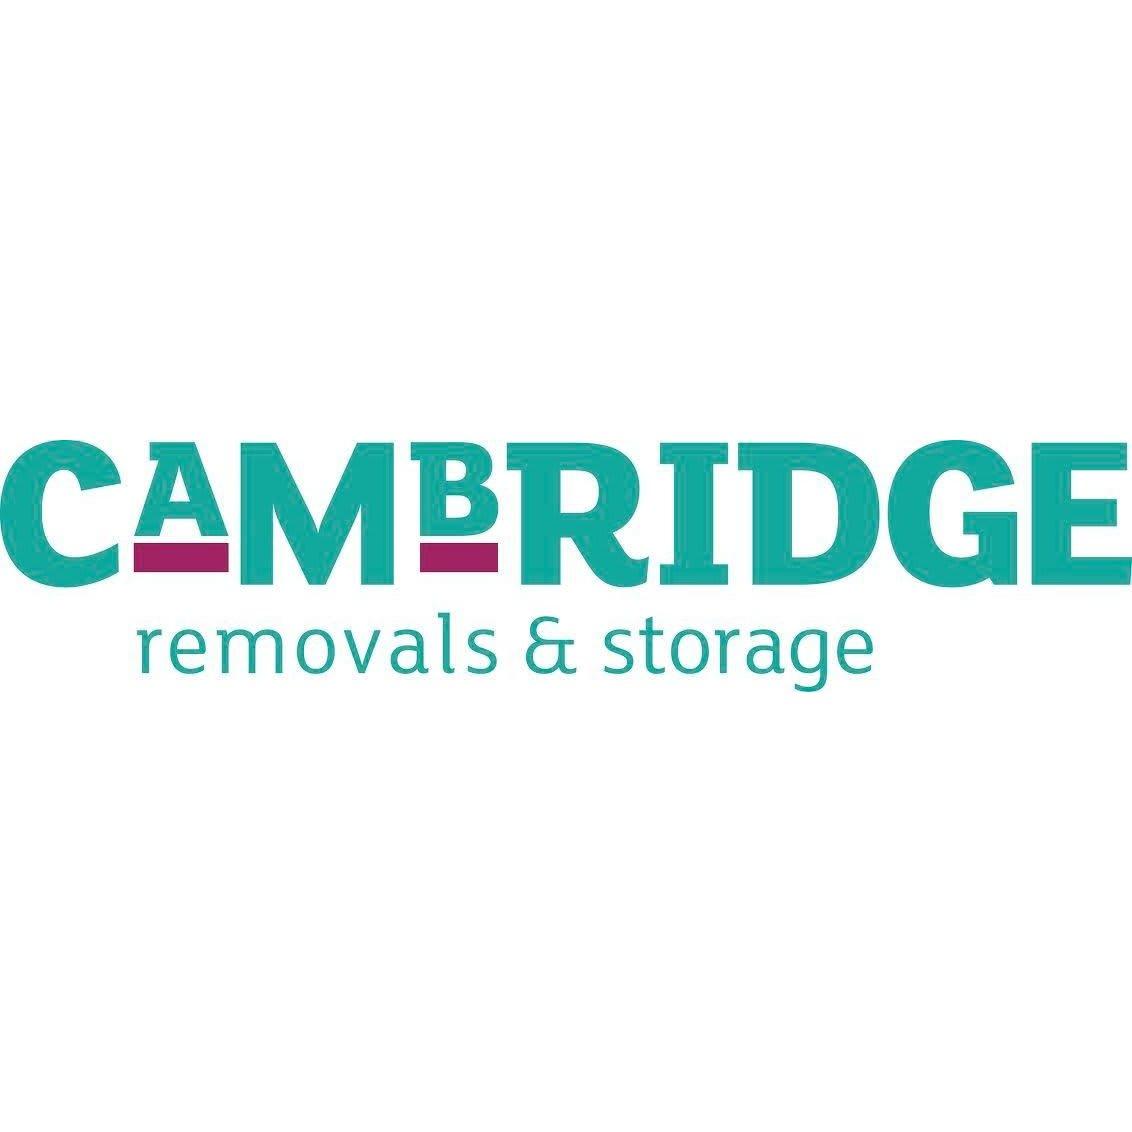 Cambridge Removals & Storage - Plymouth, Devon PL7 4FF - 01752 700225 | ShowMeLocal.com